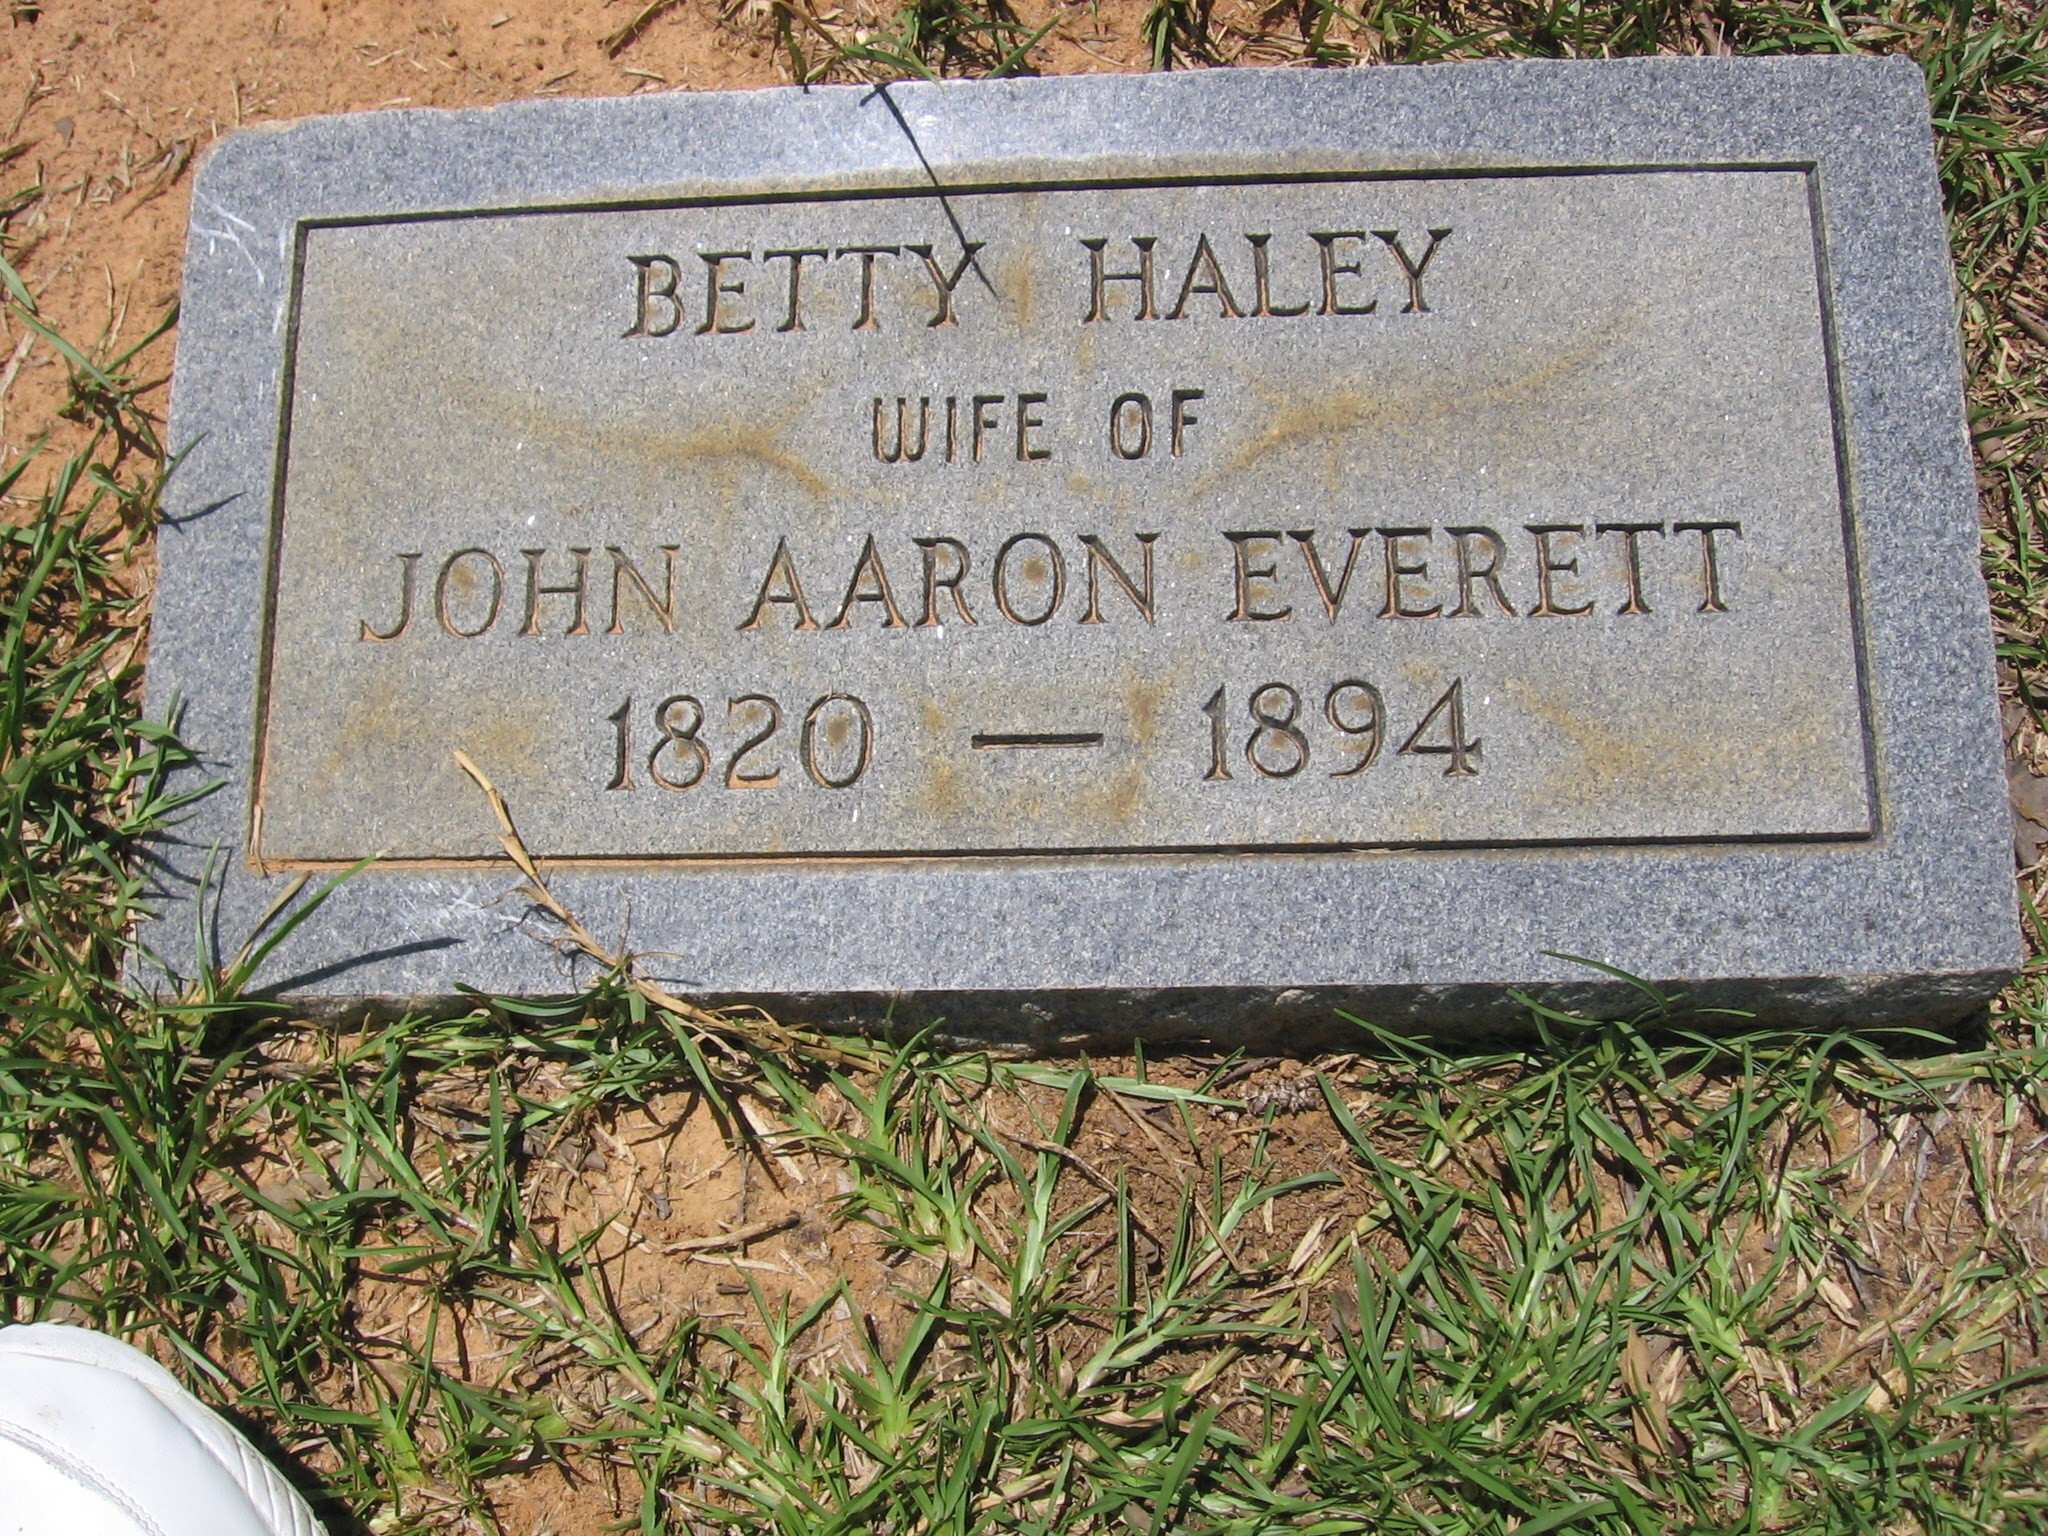 Elizabeth Haley